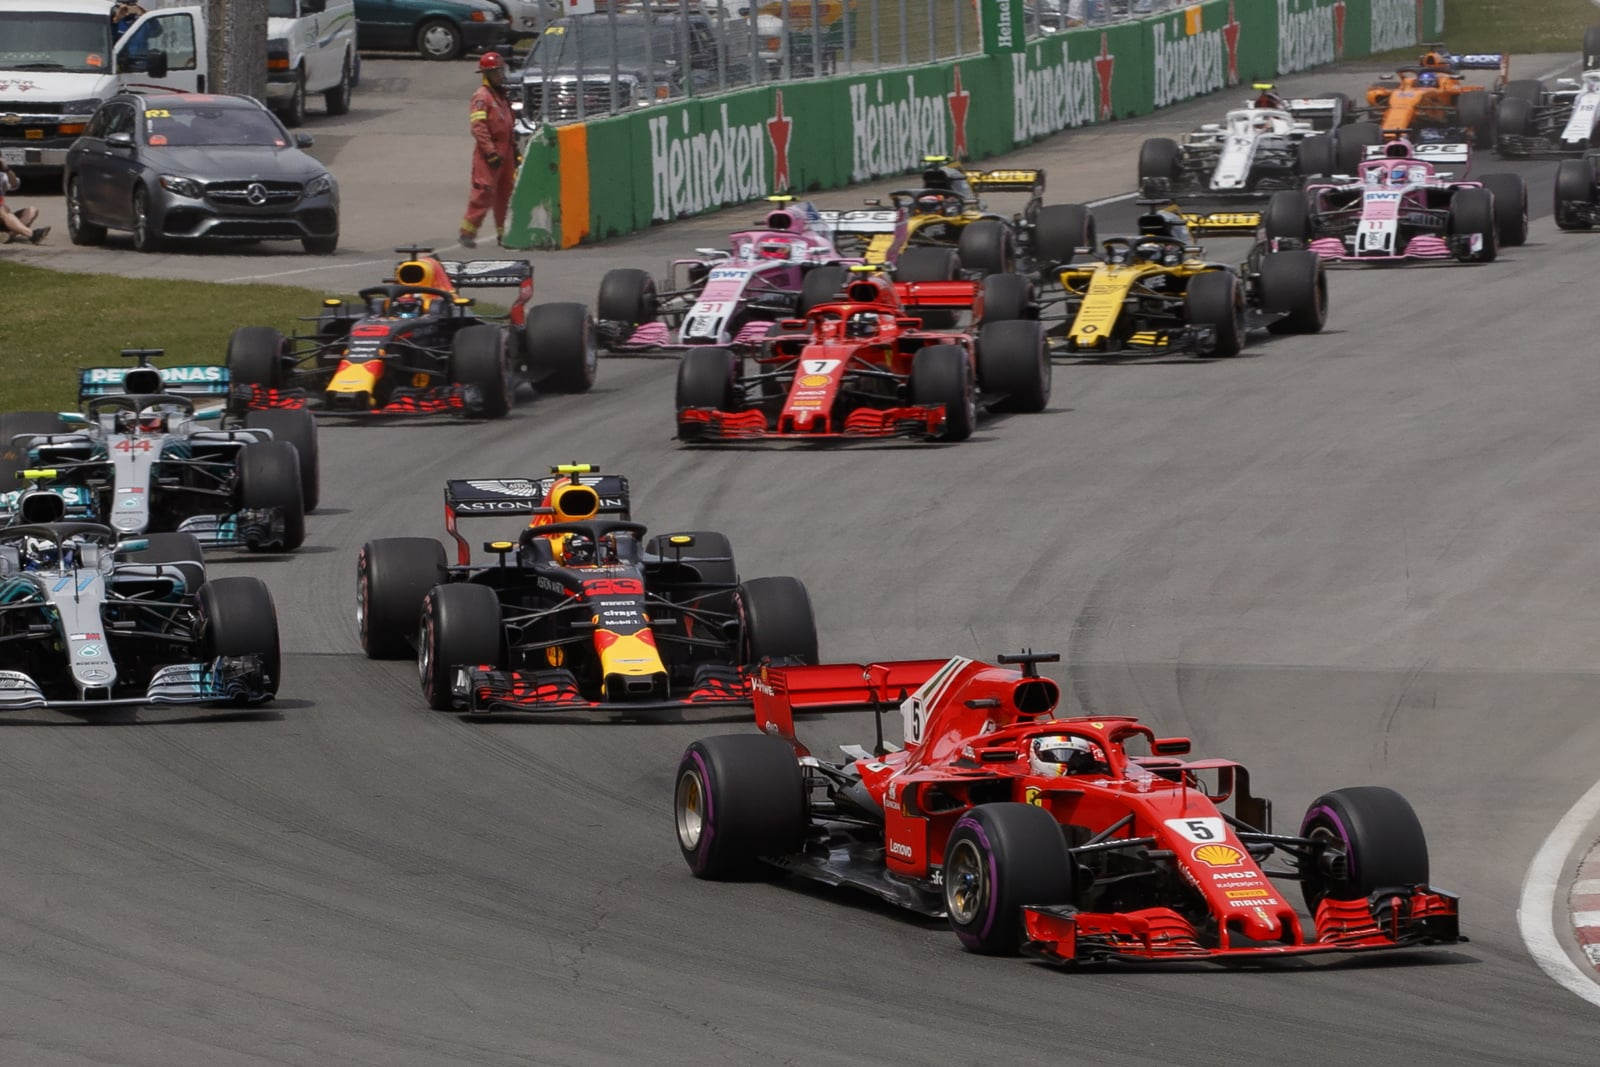 Grand Prix F1 Kanada fot. EPA/VALDRIN XHEMAJ Dostawca: PAP/EPA.